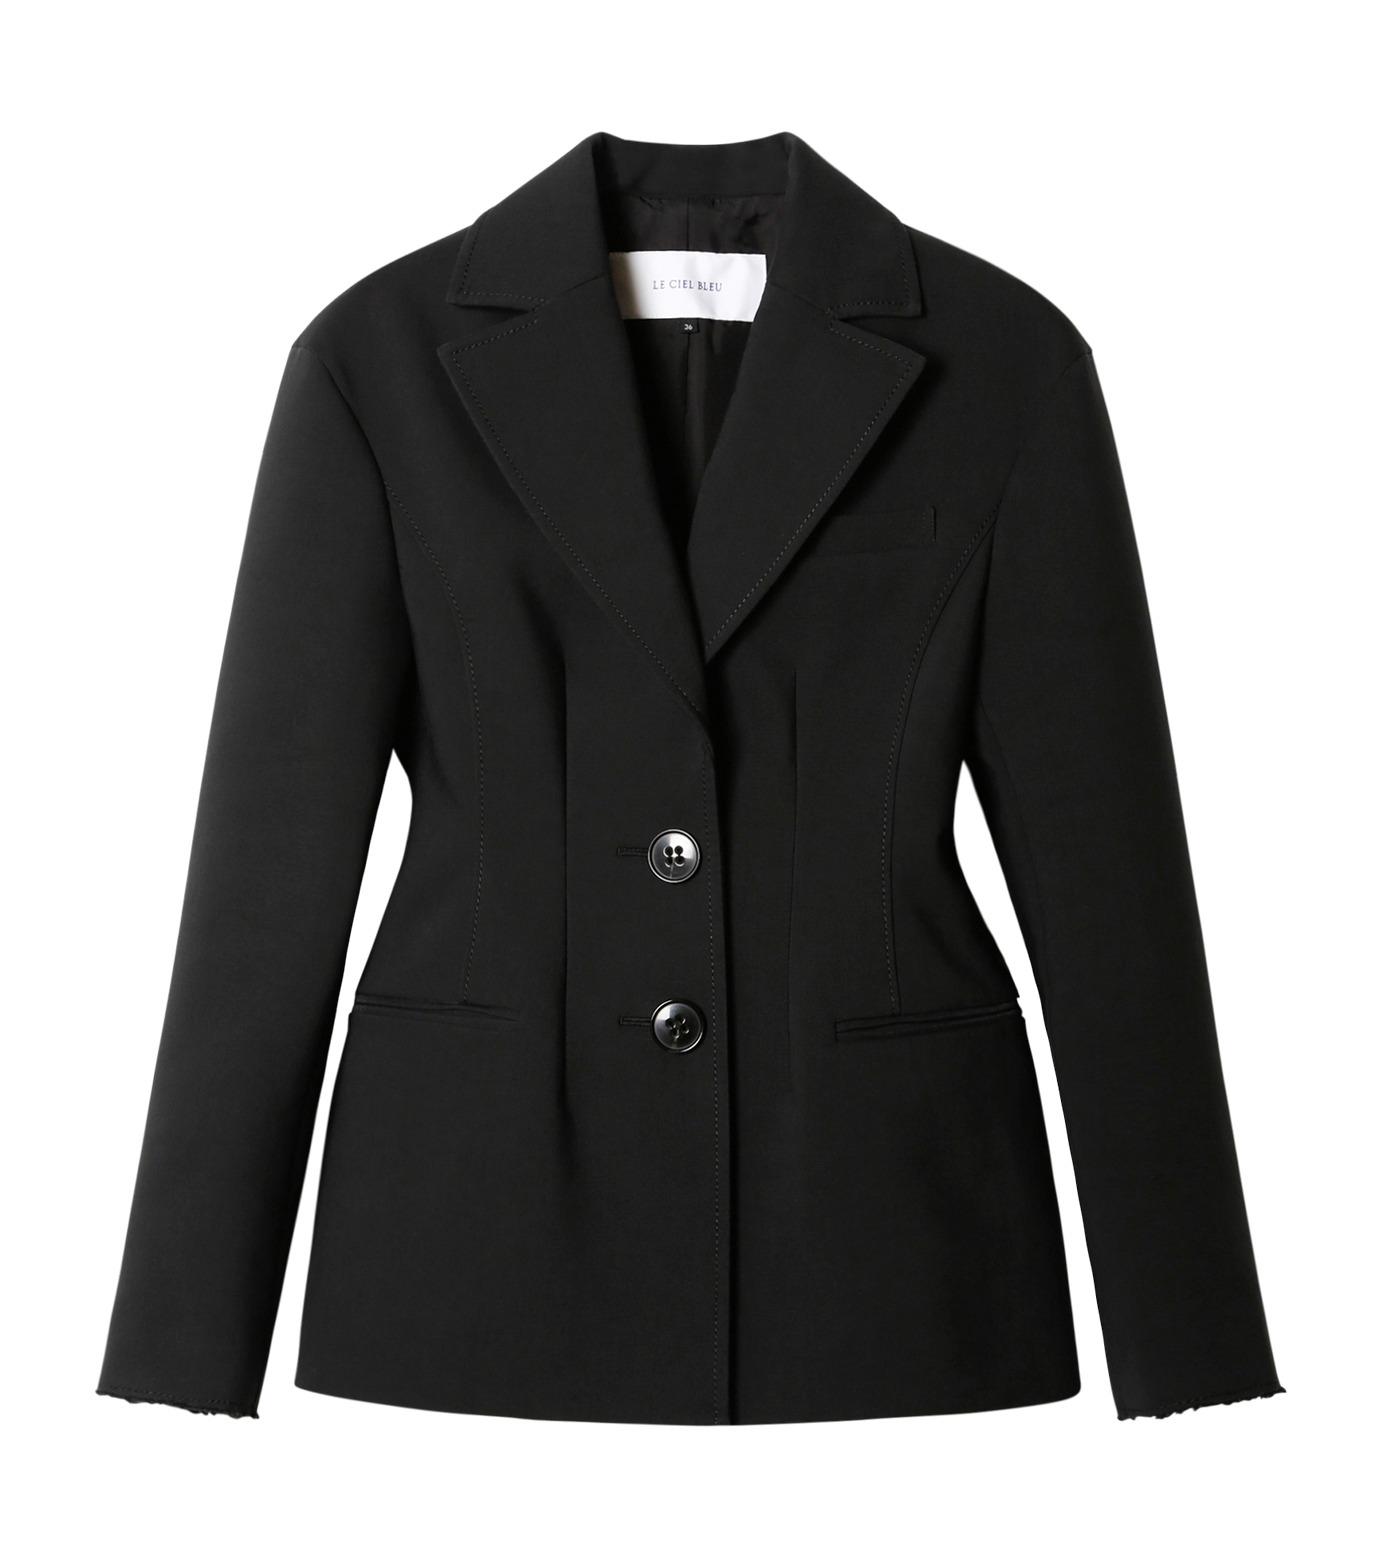 LE CIEL BLEU(ルシェルブルー)のデフォルメラインテーラージャケット-BLACK(ジャケット/jacket)-19S64103 拡大詳細画像1